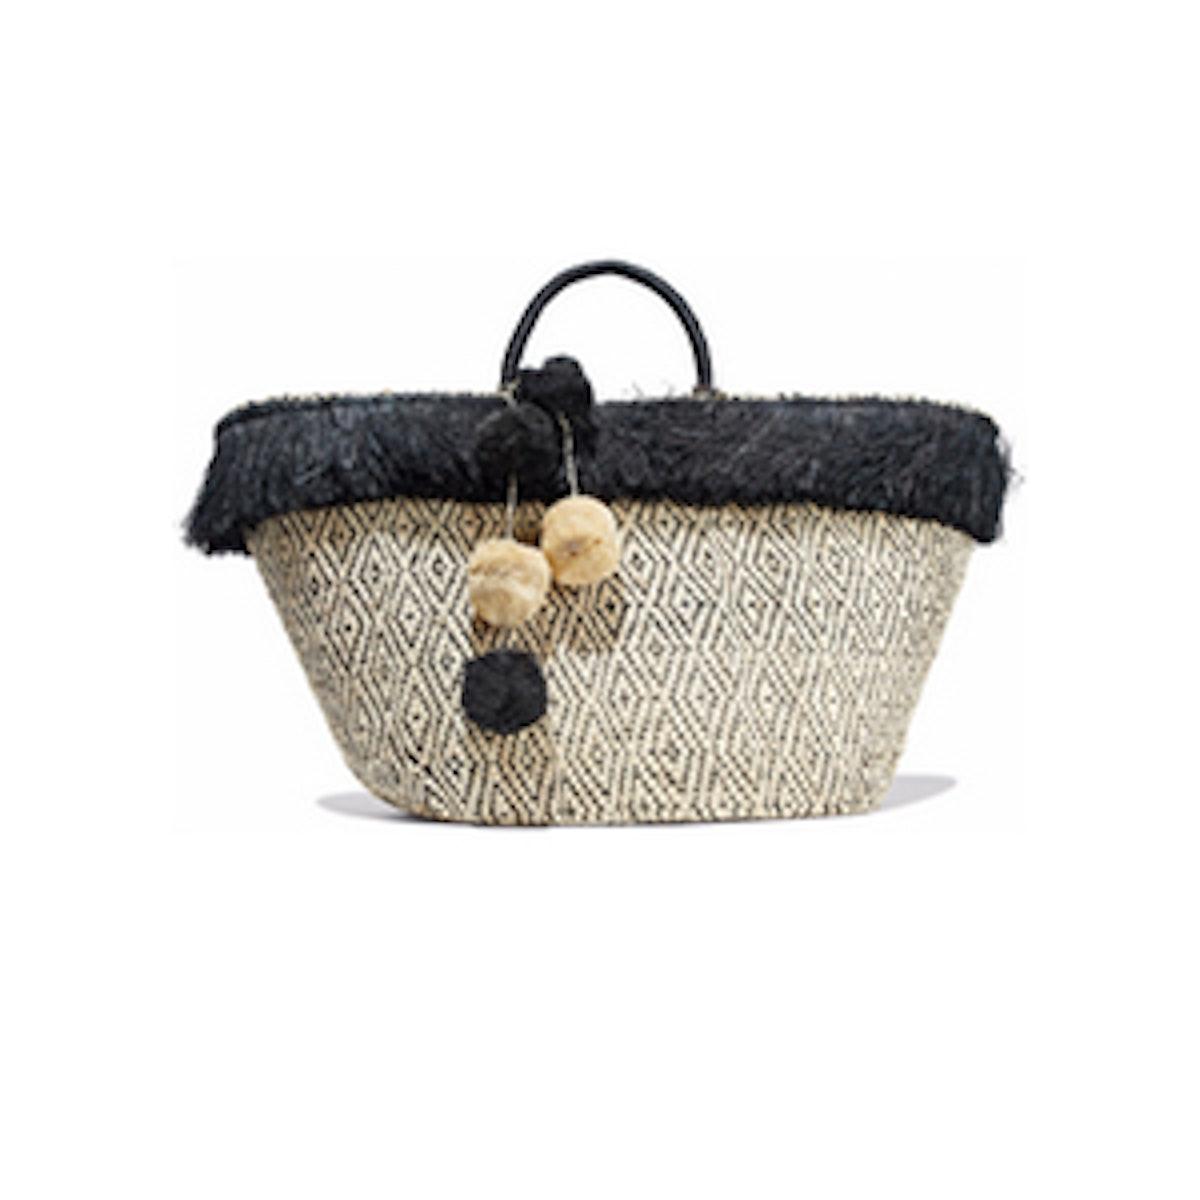 Pompom-Embellished Fringed Woven Straw Tote